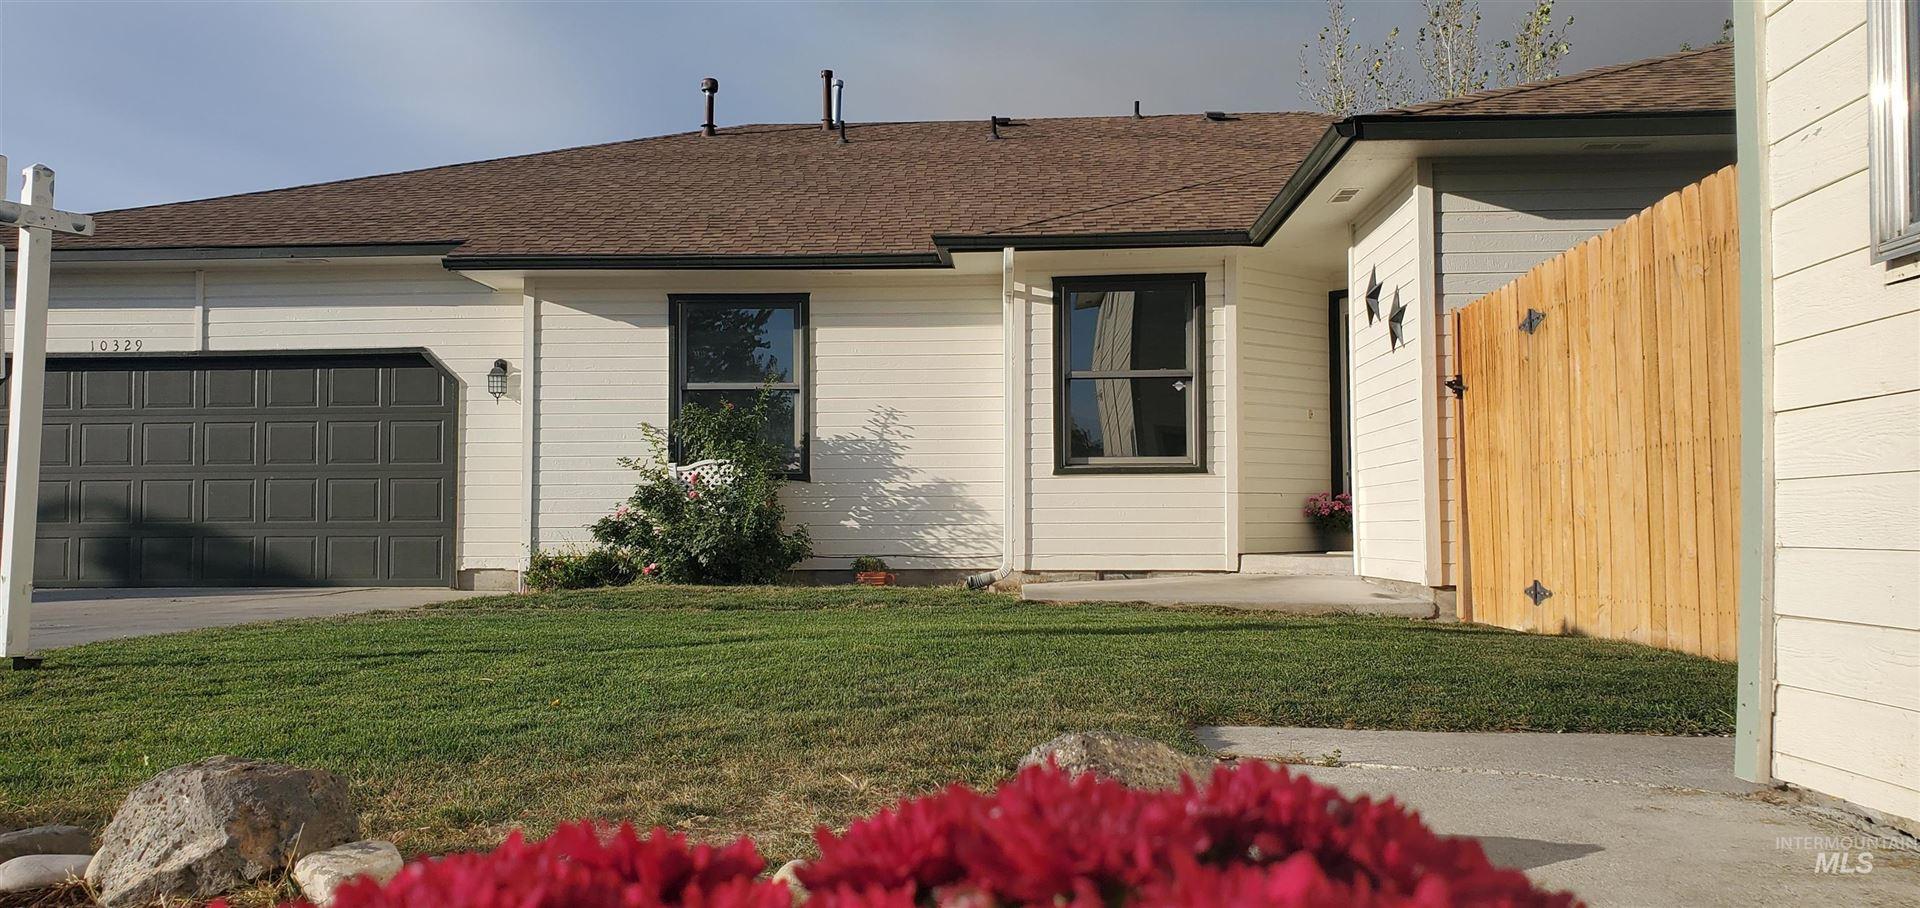 10329 W Granger Ave, Boise, ID 83704 - MLS#: 98820801